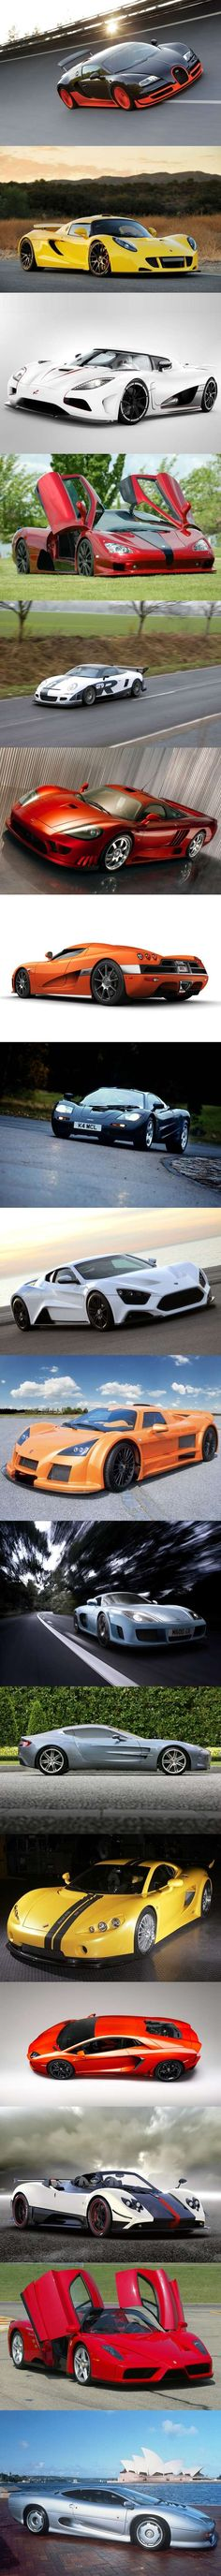 Read More About Bugatti Veyron Super Sport:429 km/h    Hennessey Venom GT:418 km/h    Koenigsegg Agera R:418 km/h    SSC Ultimate Aero:413 km/h    9ff GT9-R:413 km/h    Saleen S7 Twin-Turbo:399 km/h    Ko...